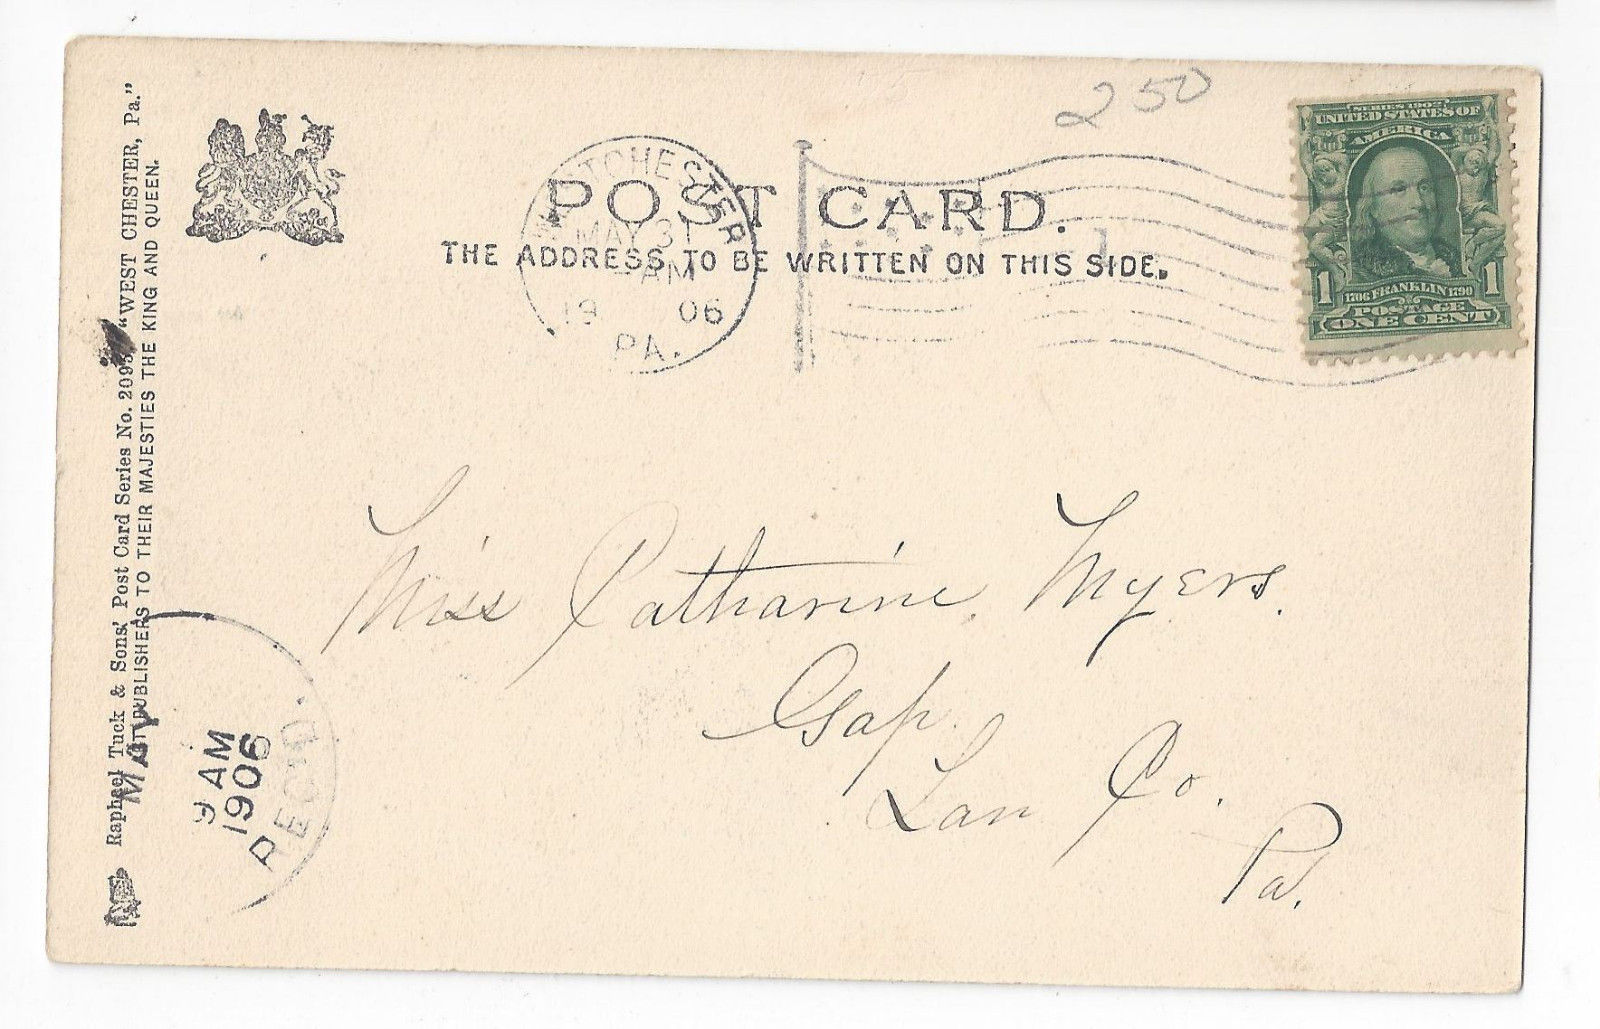 PA West Chester Westminster Presbyterian Church Vtg 1906 Tuck UDB Postcard